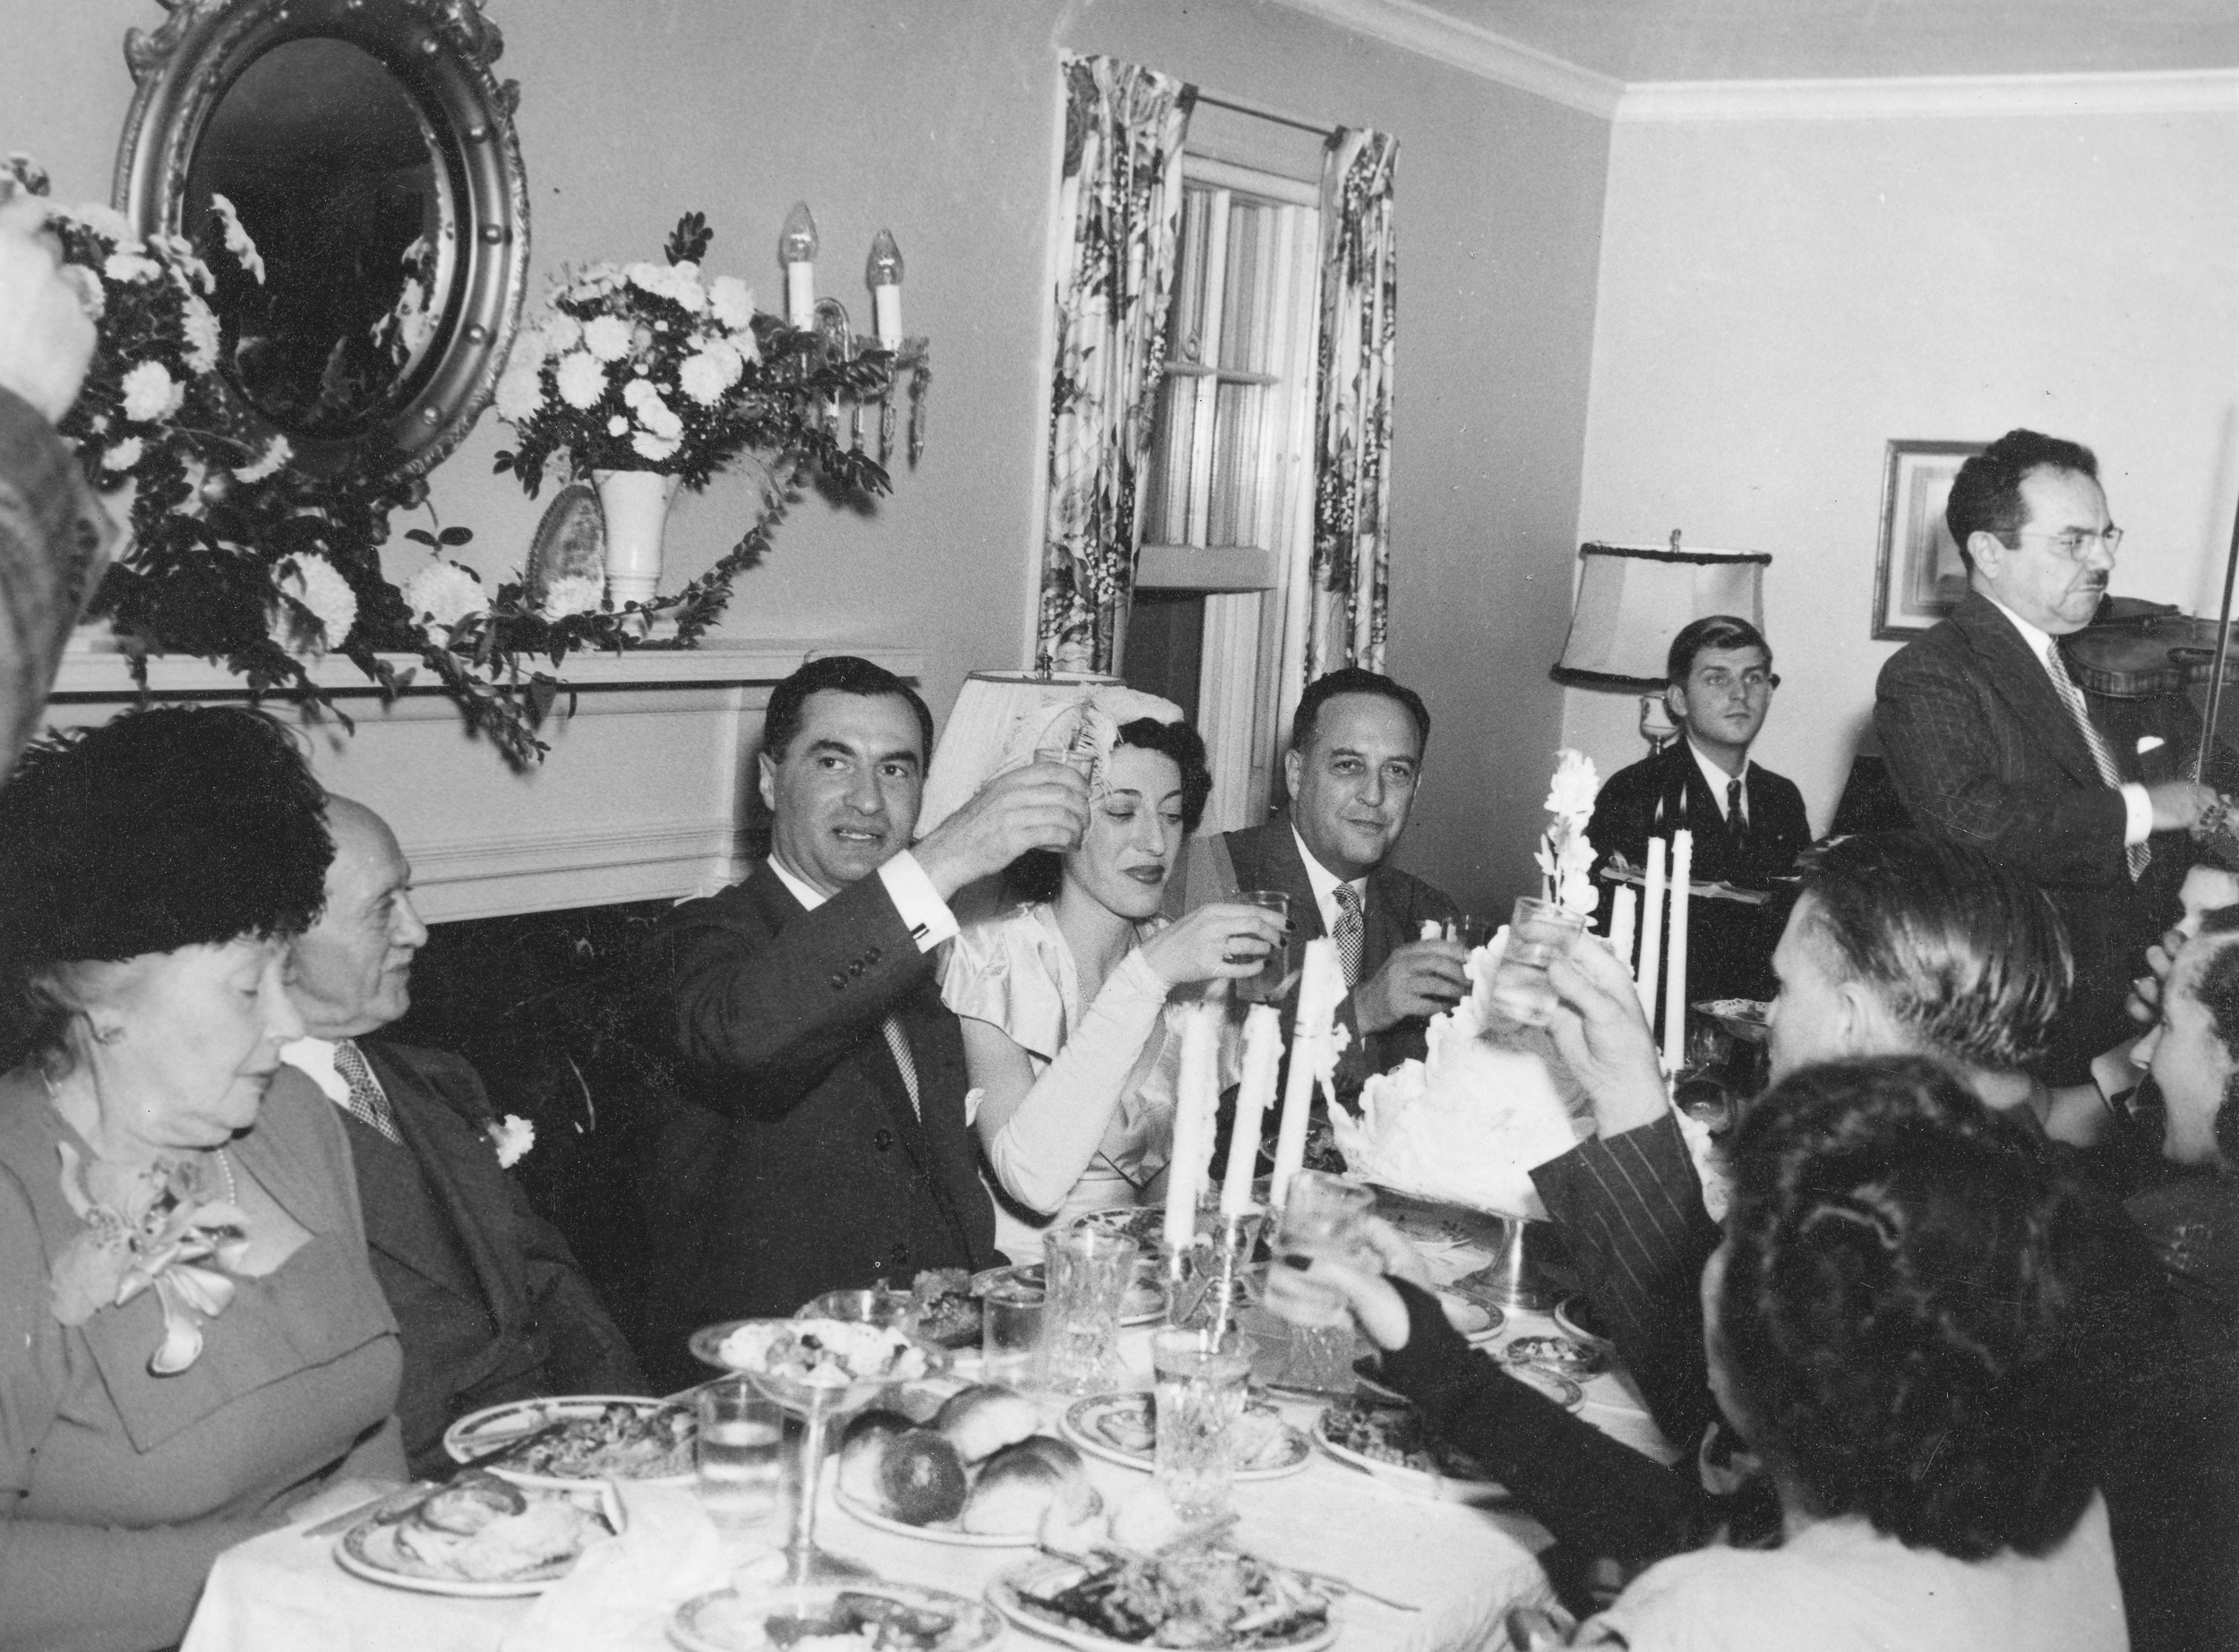 Wedding reception, Hamden, CT. 1946